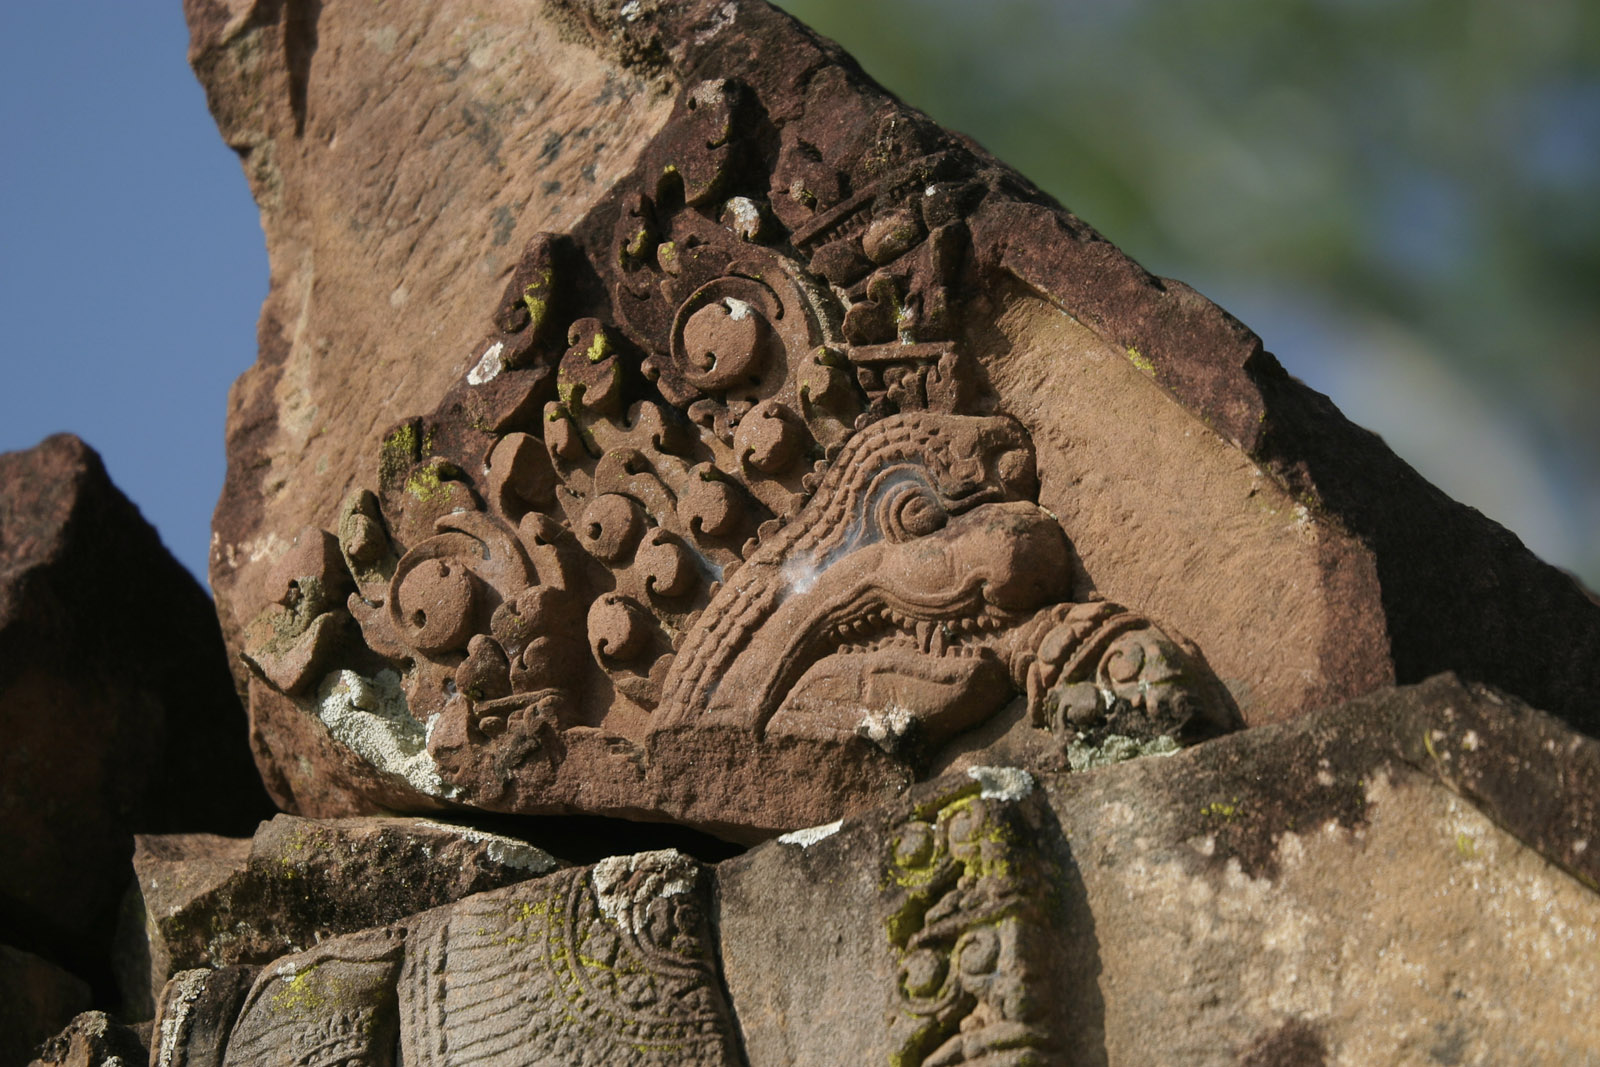 File:A Naga, a half-man, half-snake creature (4188438144 ... - photo#17